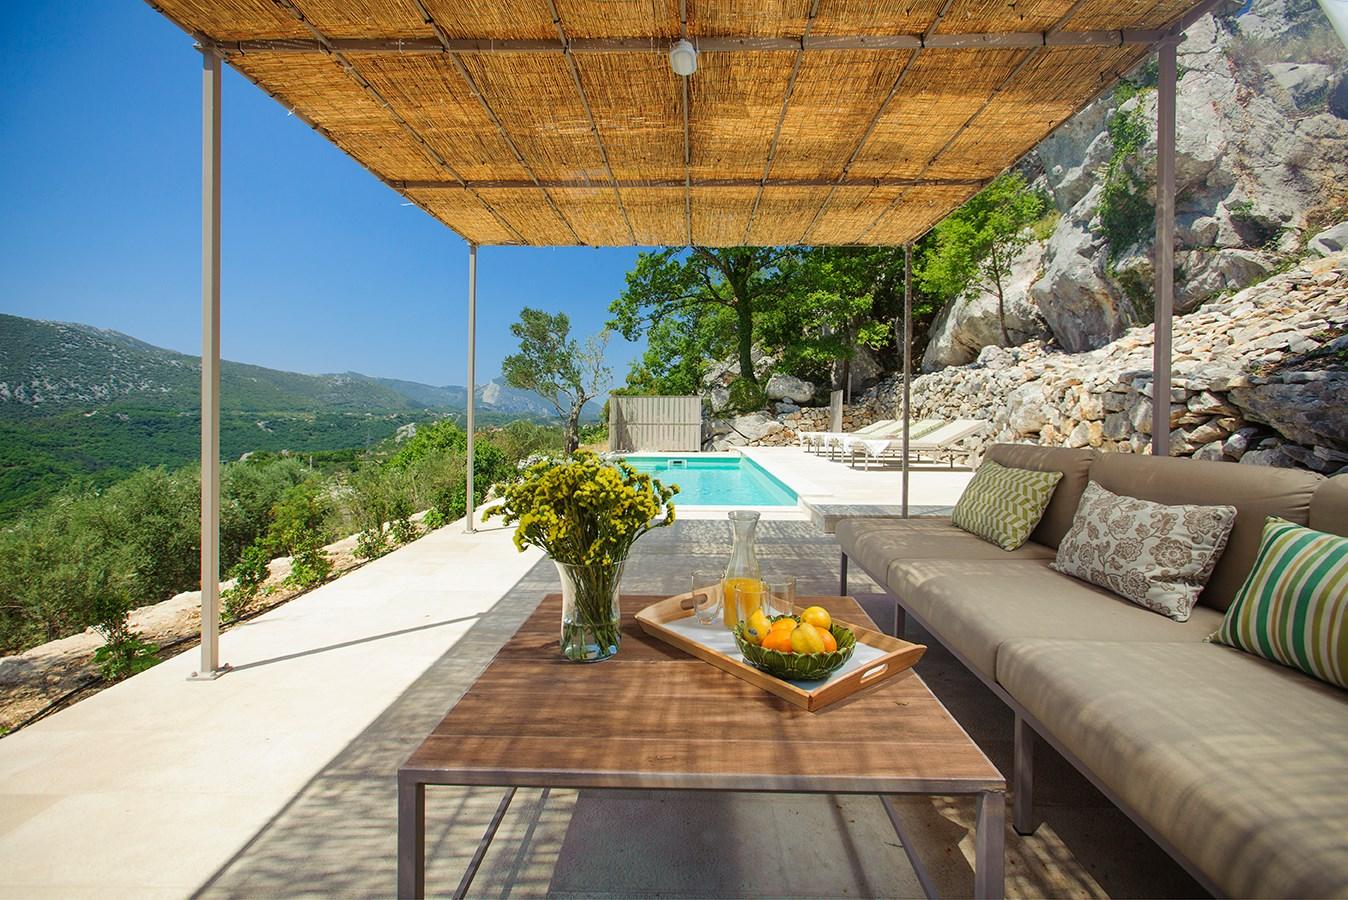 Ferienhaus  (2474393), Kostanje, , Dalmatien, Kroatien, Bild 6